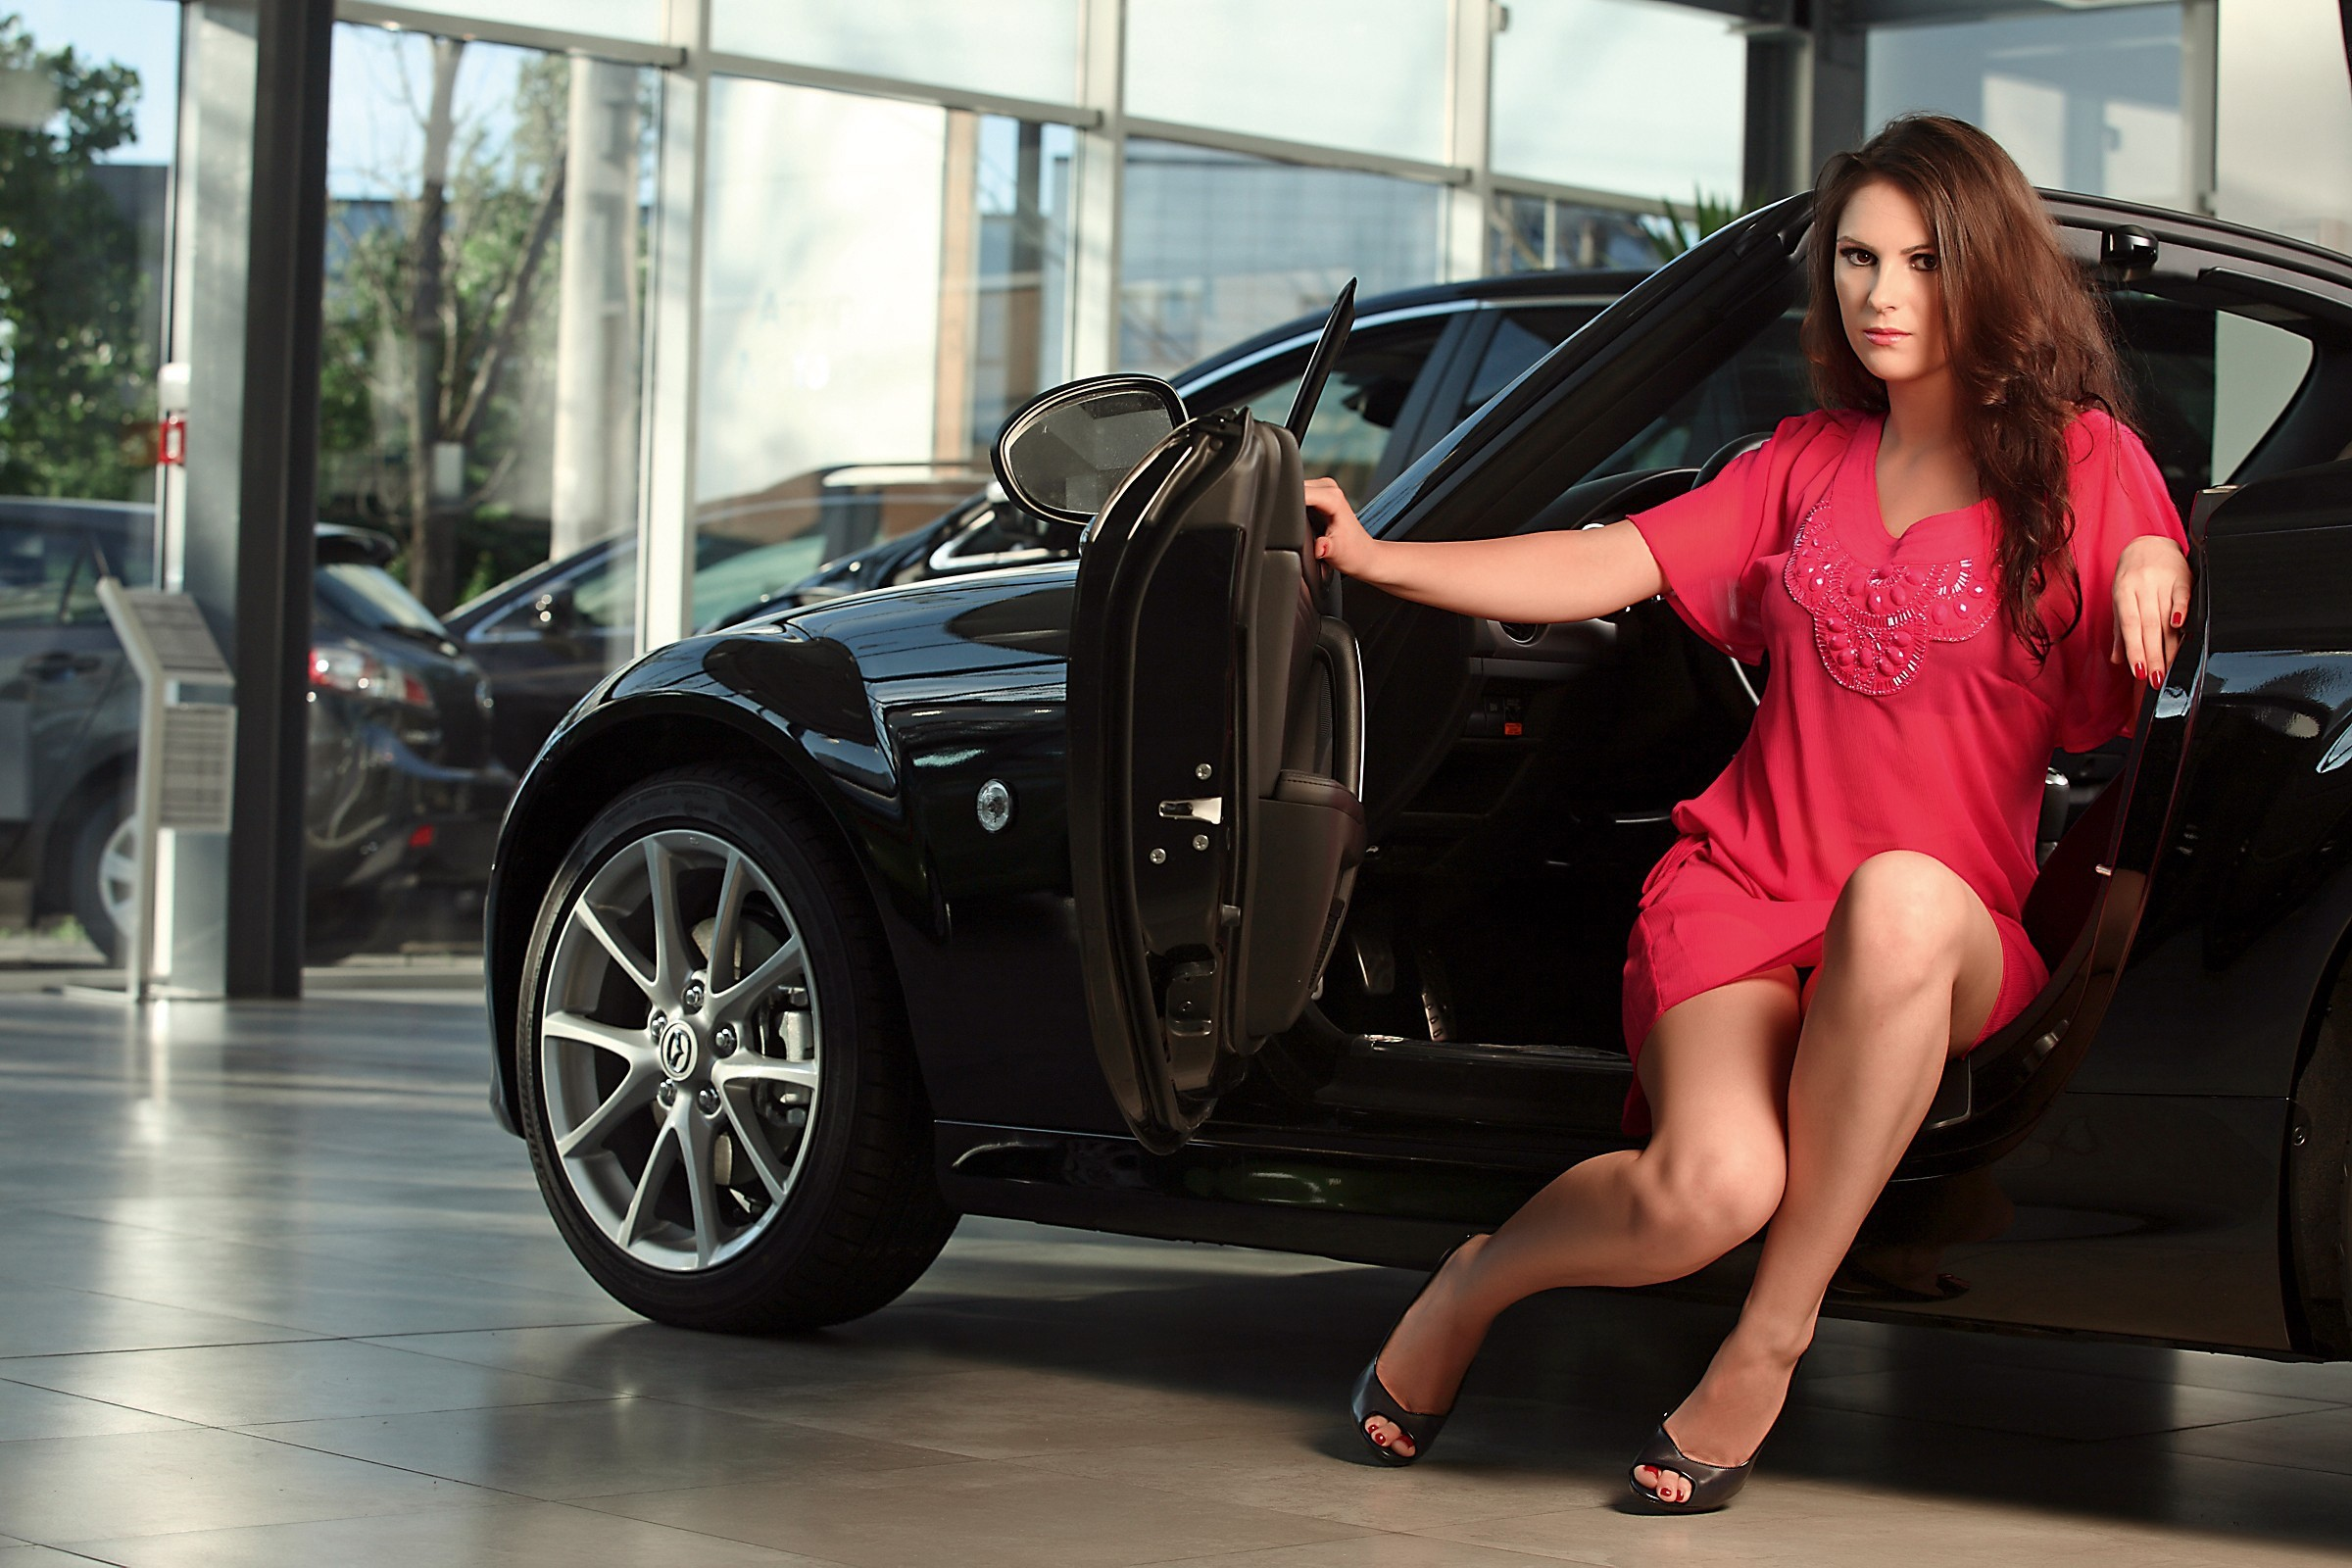 Young neked women posing on cars girlls lebanon nude